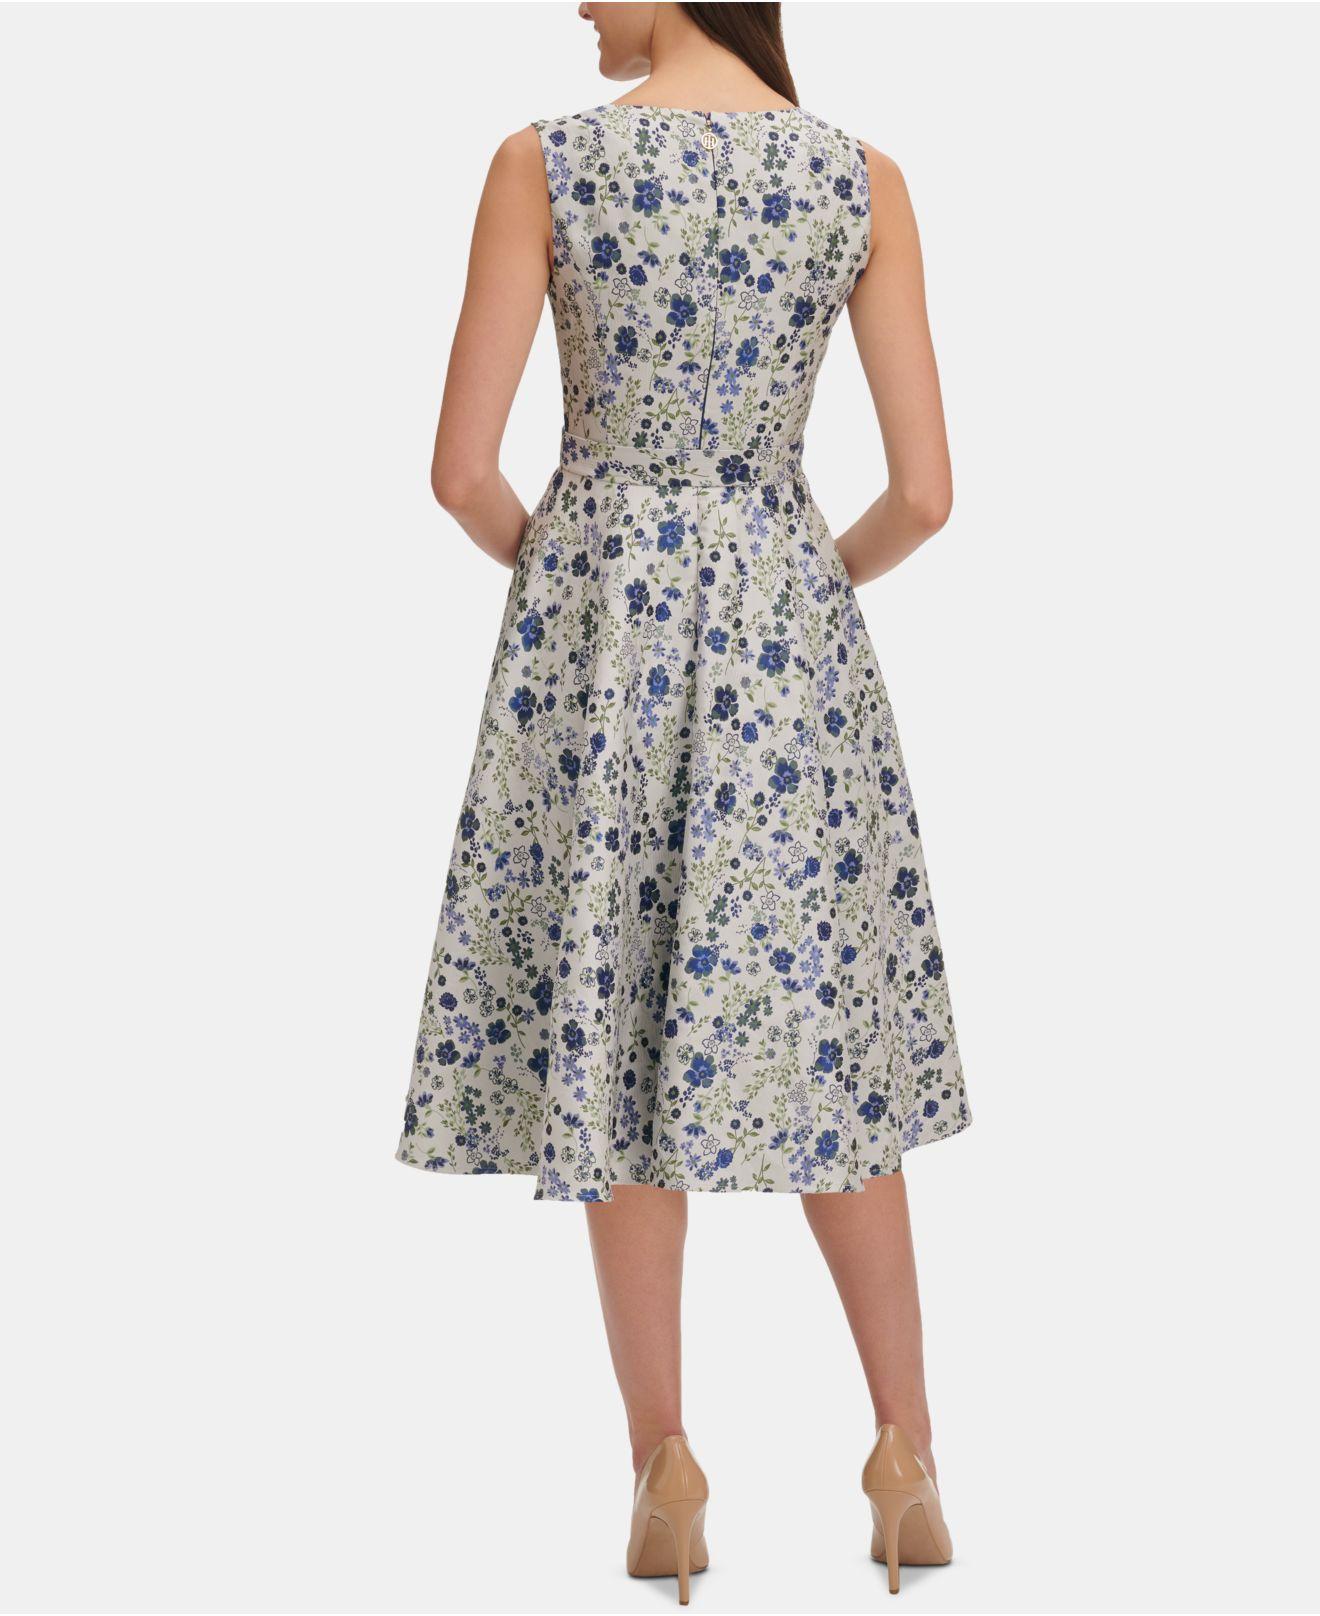 1f2e75ef6003 Lyst - Tommy Hilfiger Floral Jacquard Fit & Flare Dress in Blue